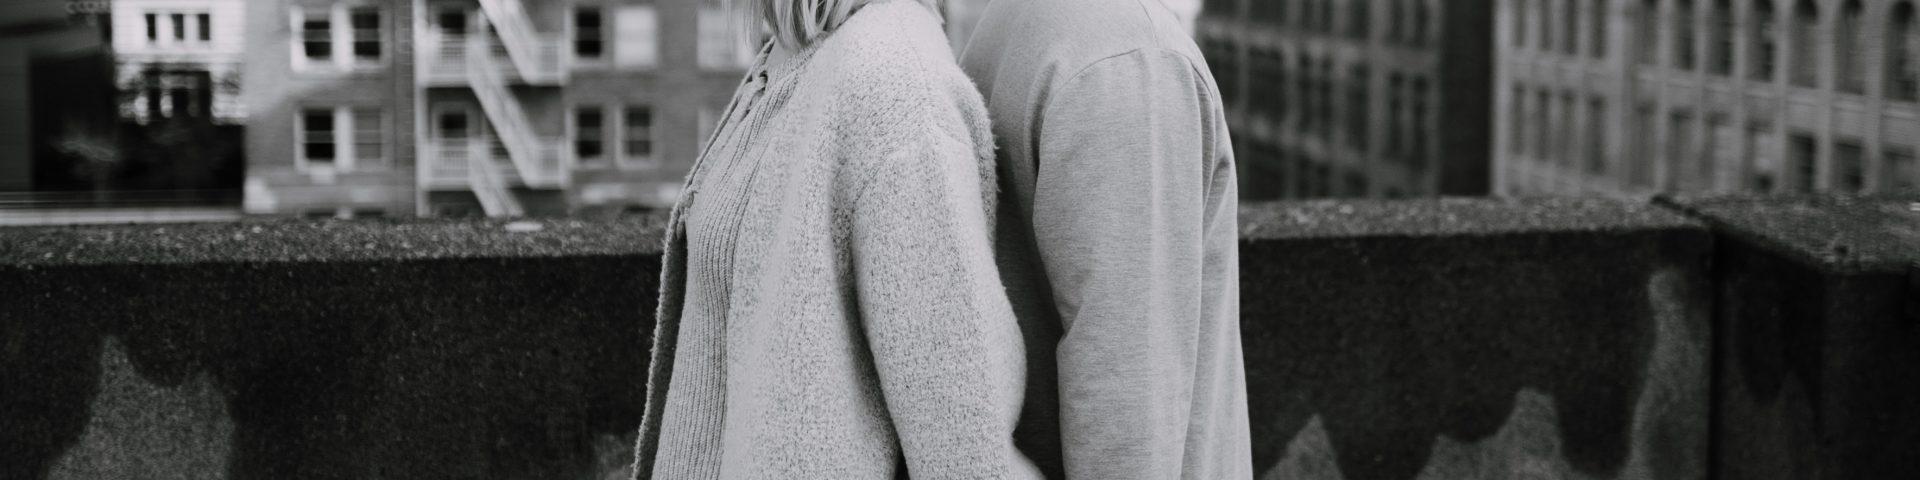 On-Off-Beziehung